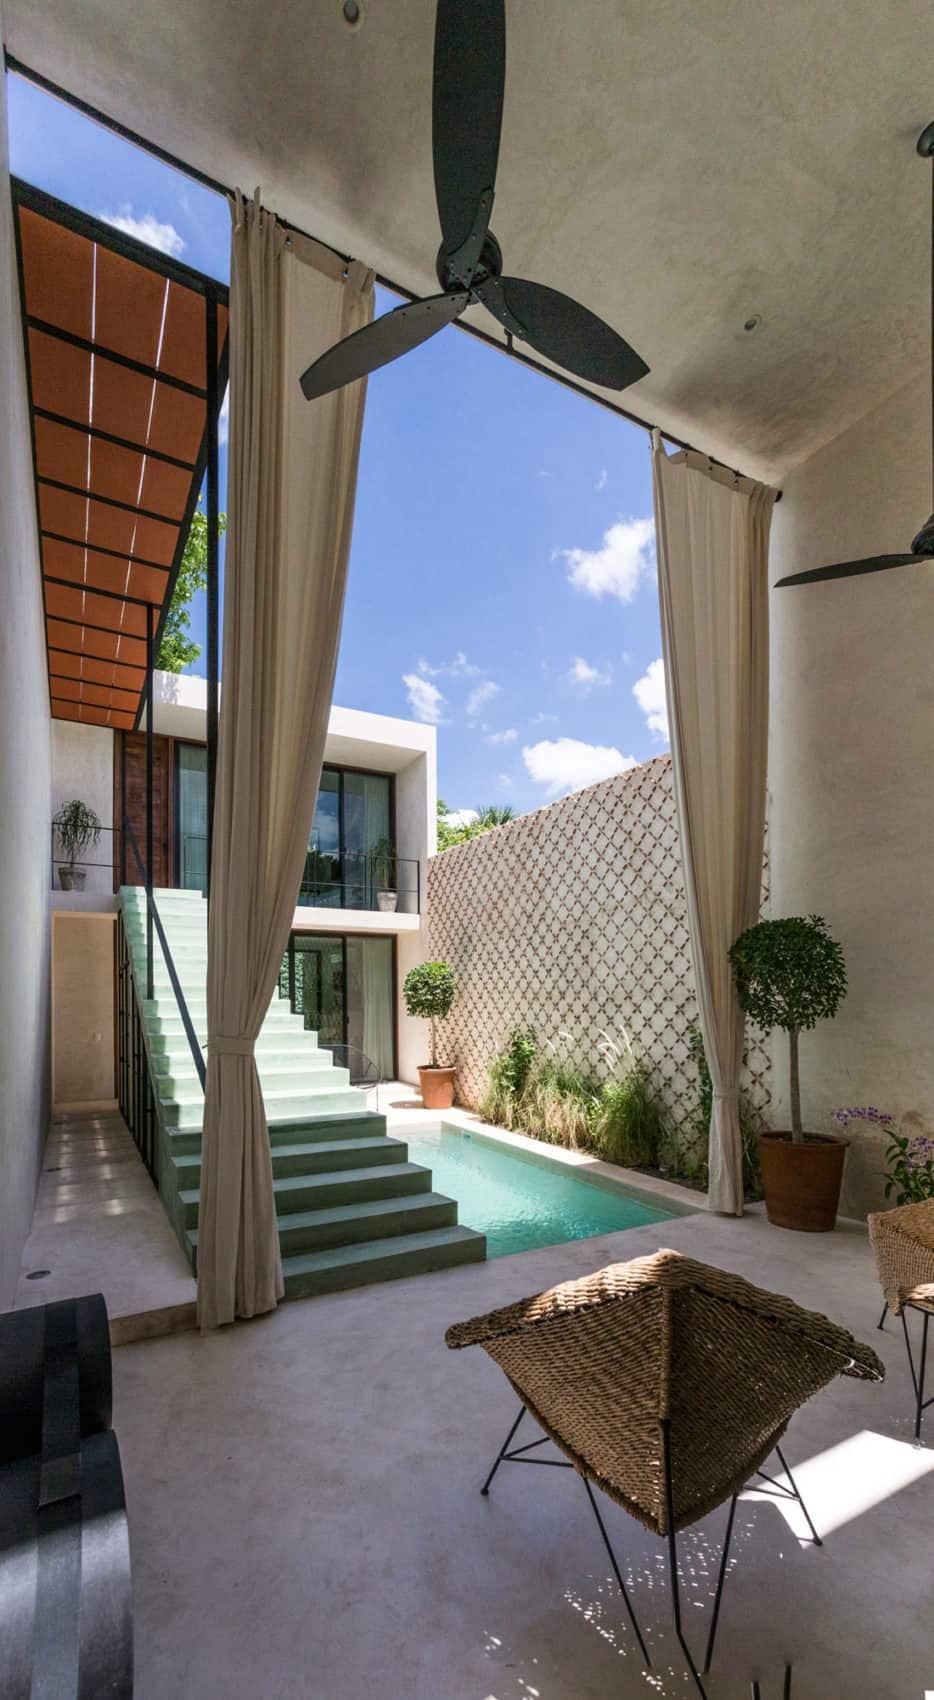 Casa del Limonero by Taller Estilo Arquitectura (3)